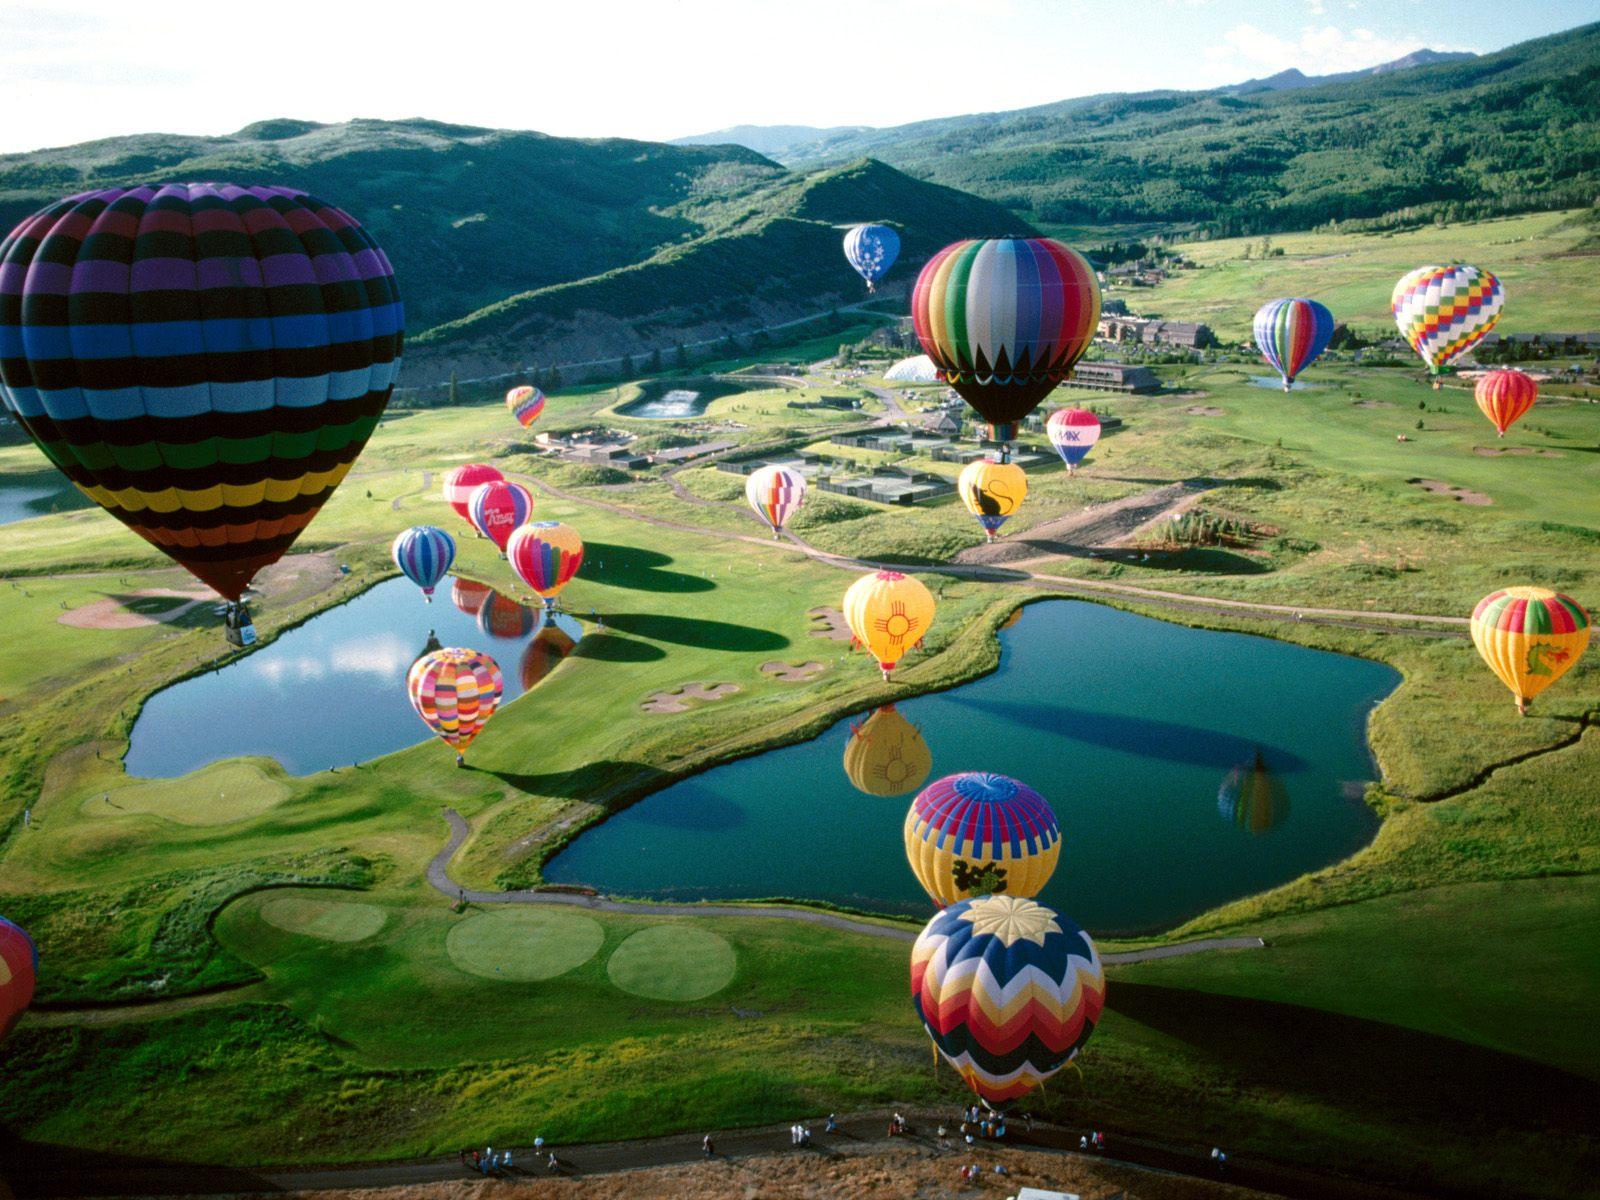 Most Inspiring Wallpaper Night Hot Air Balloon - Hot-Air-Balloon-Pictures-Wallpapers-052  You Should Have-249033.jpg